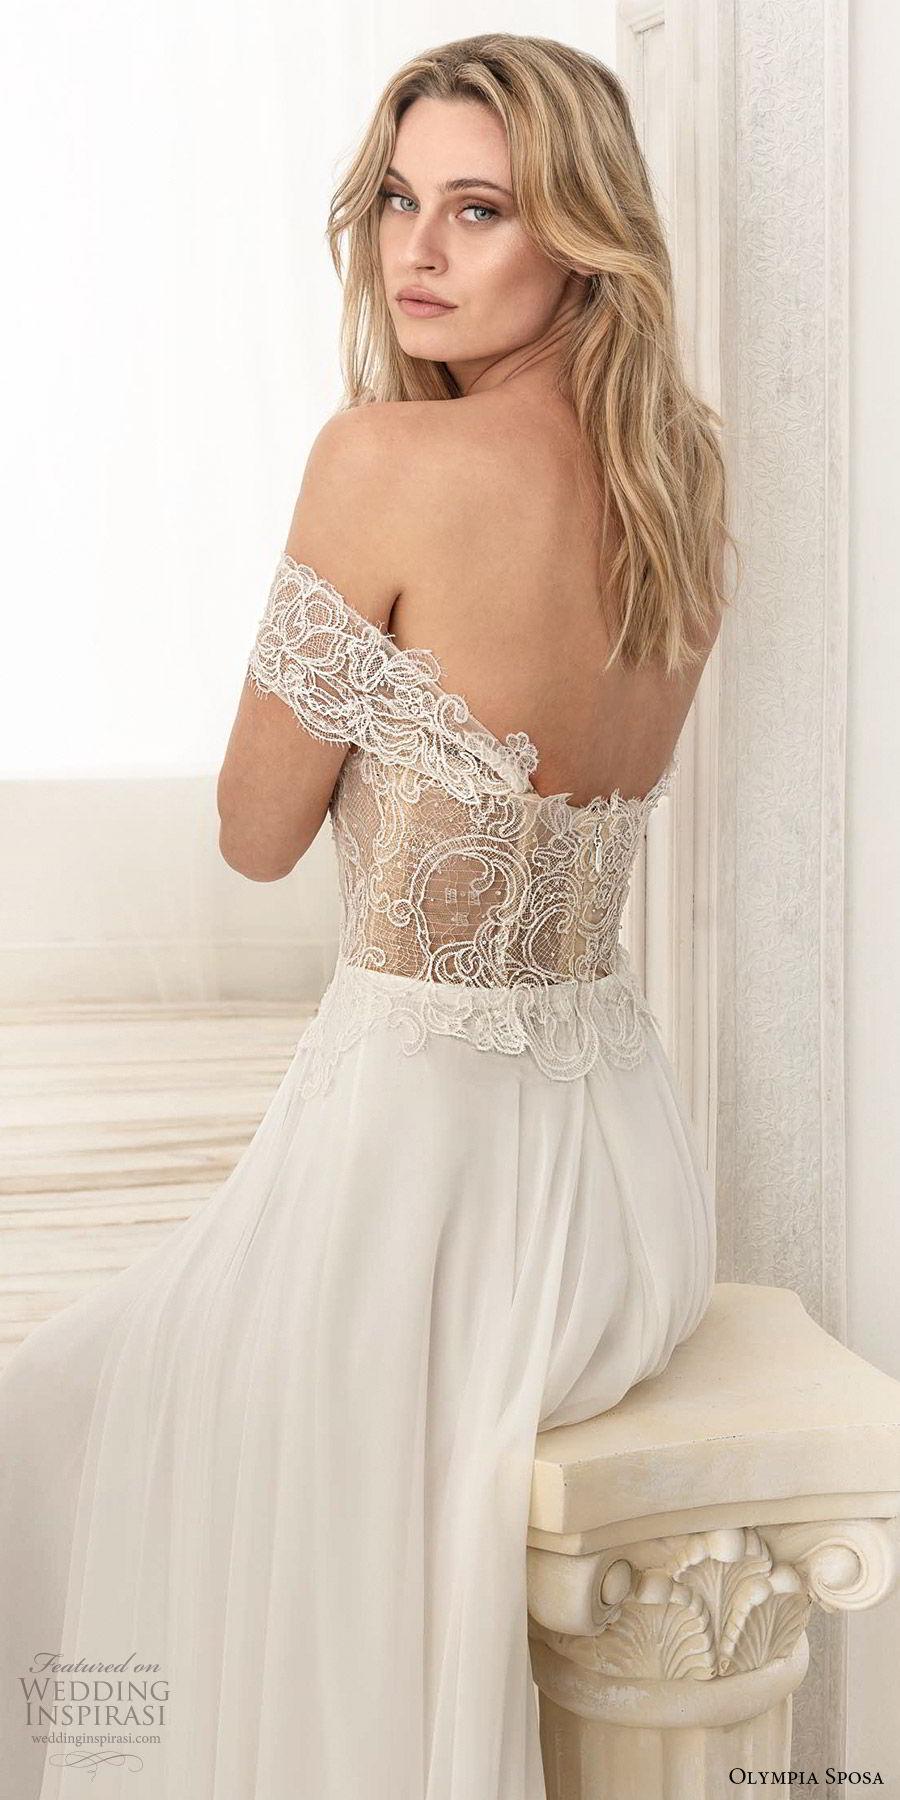 olympia sposa 2020 bridal off shoulder sweetheart neckline embellished bodice a line ball gown wedding dress (1) romantic elegant sweep train zbv